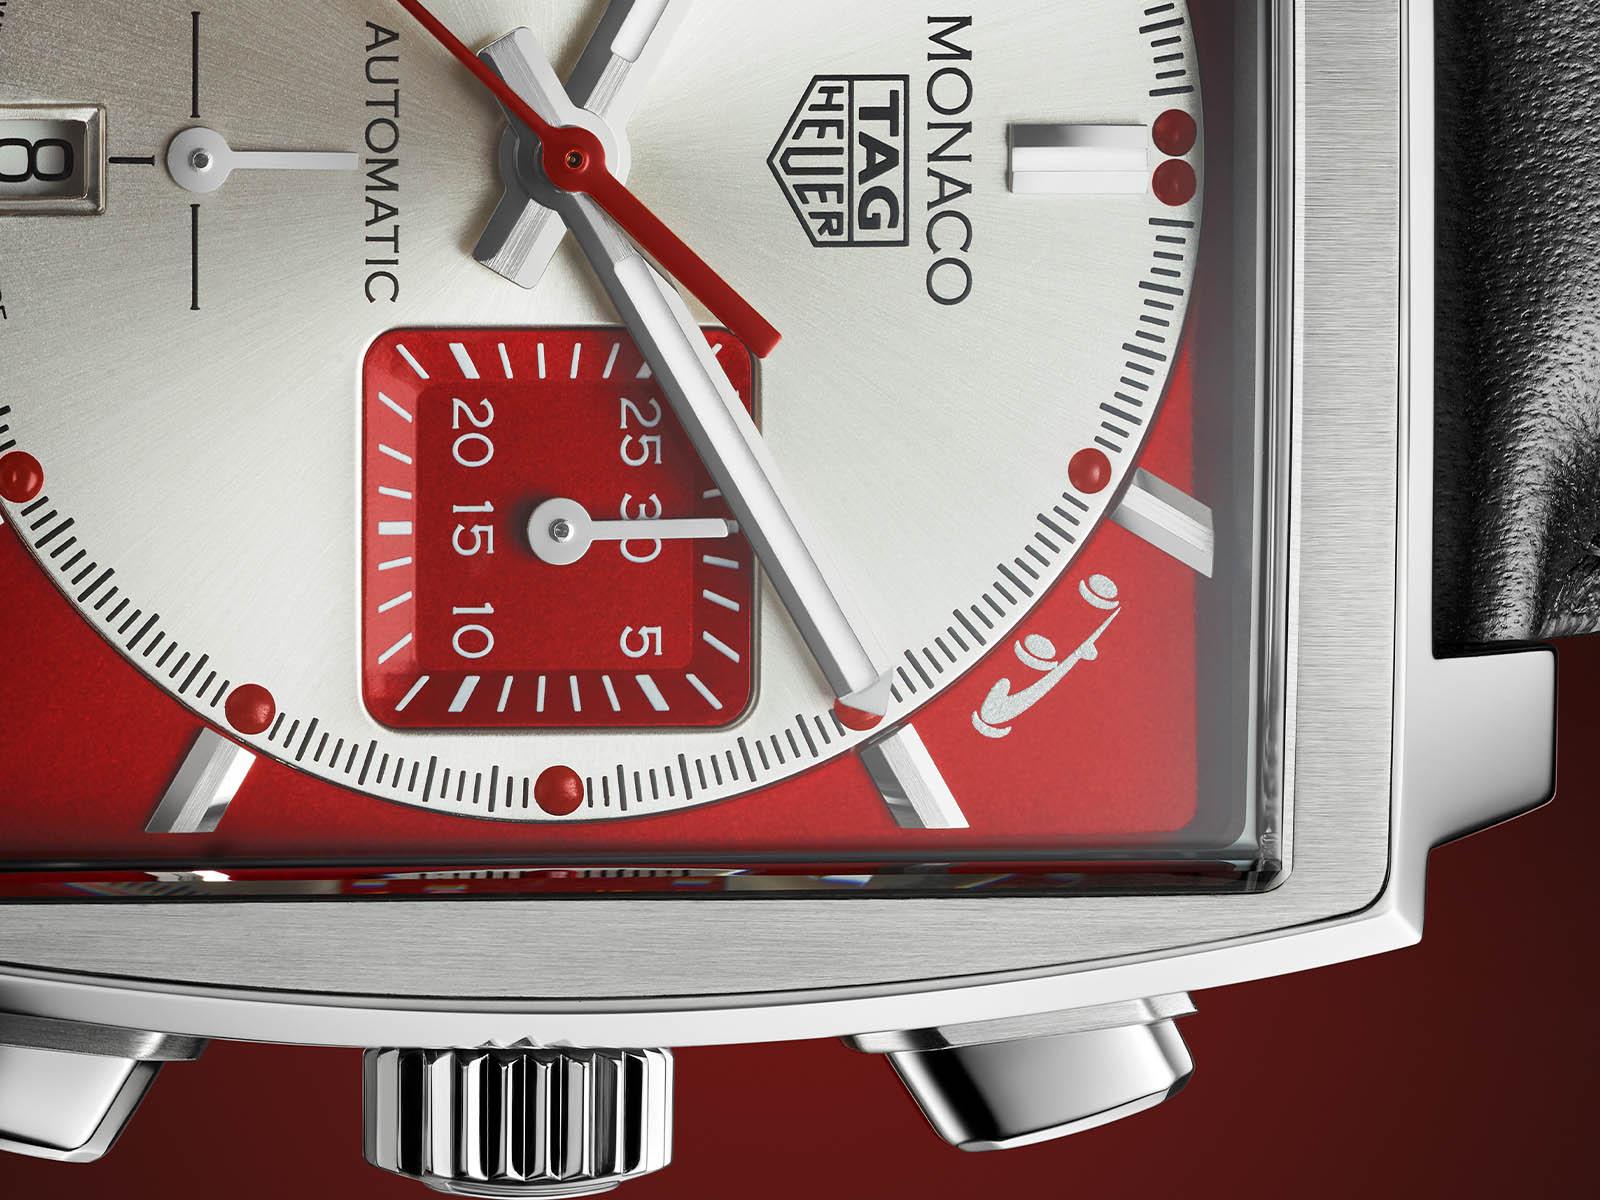 cbl2114-fc6486-tag-heuer-monaco-grand-prix-de-monaco-historique-limited-edition-3.jpg